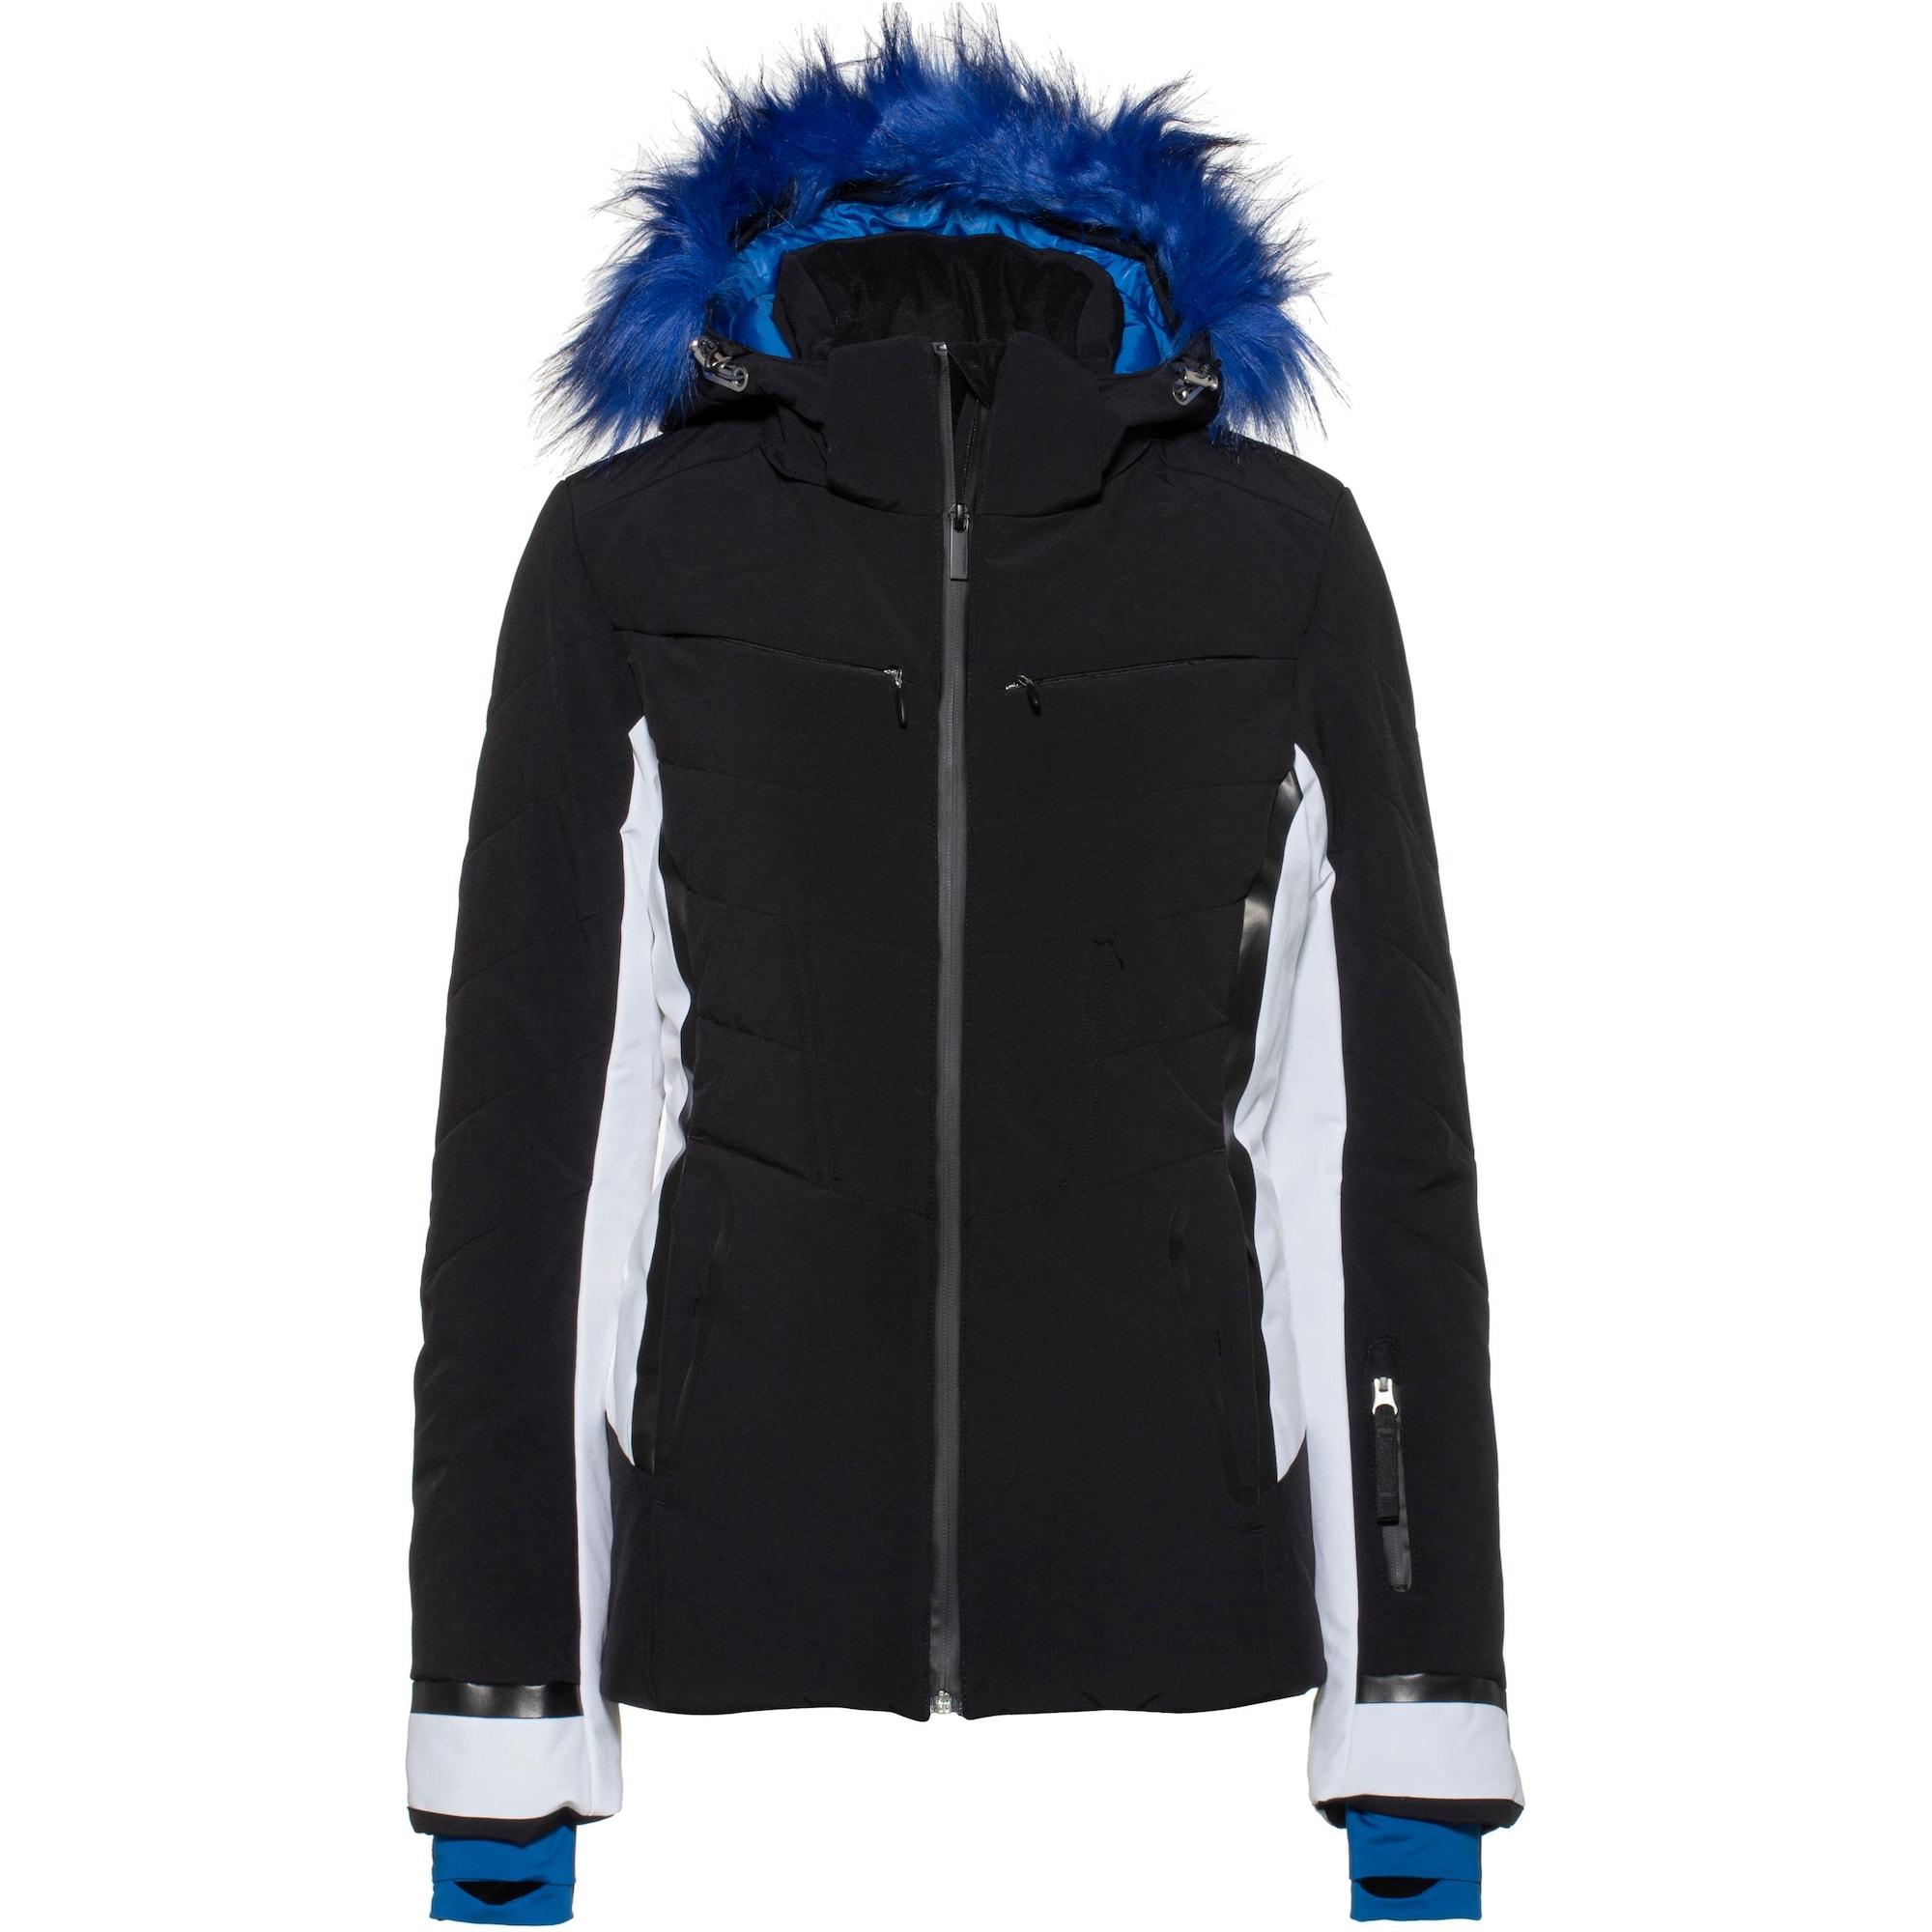 Skijacke 'Elaine'   Sportbekleidung > Sportjacken > Skijacken   icepeak